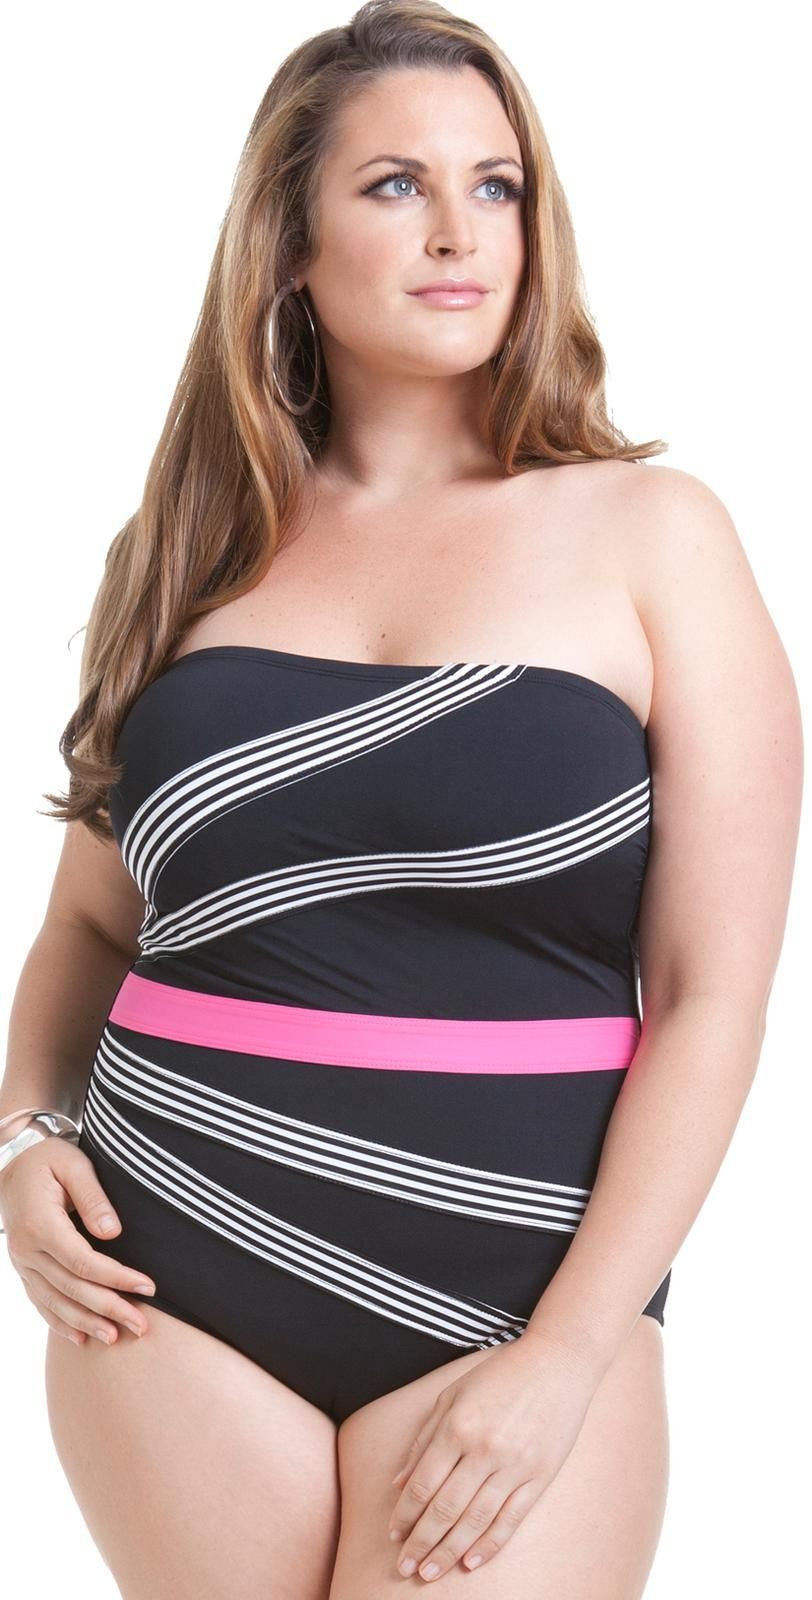 annecole 2014 plus size mini stripe color block #swimsuit 14po018